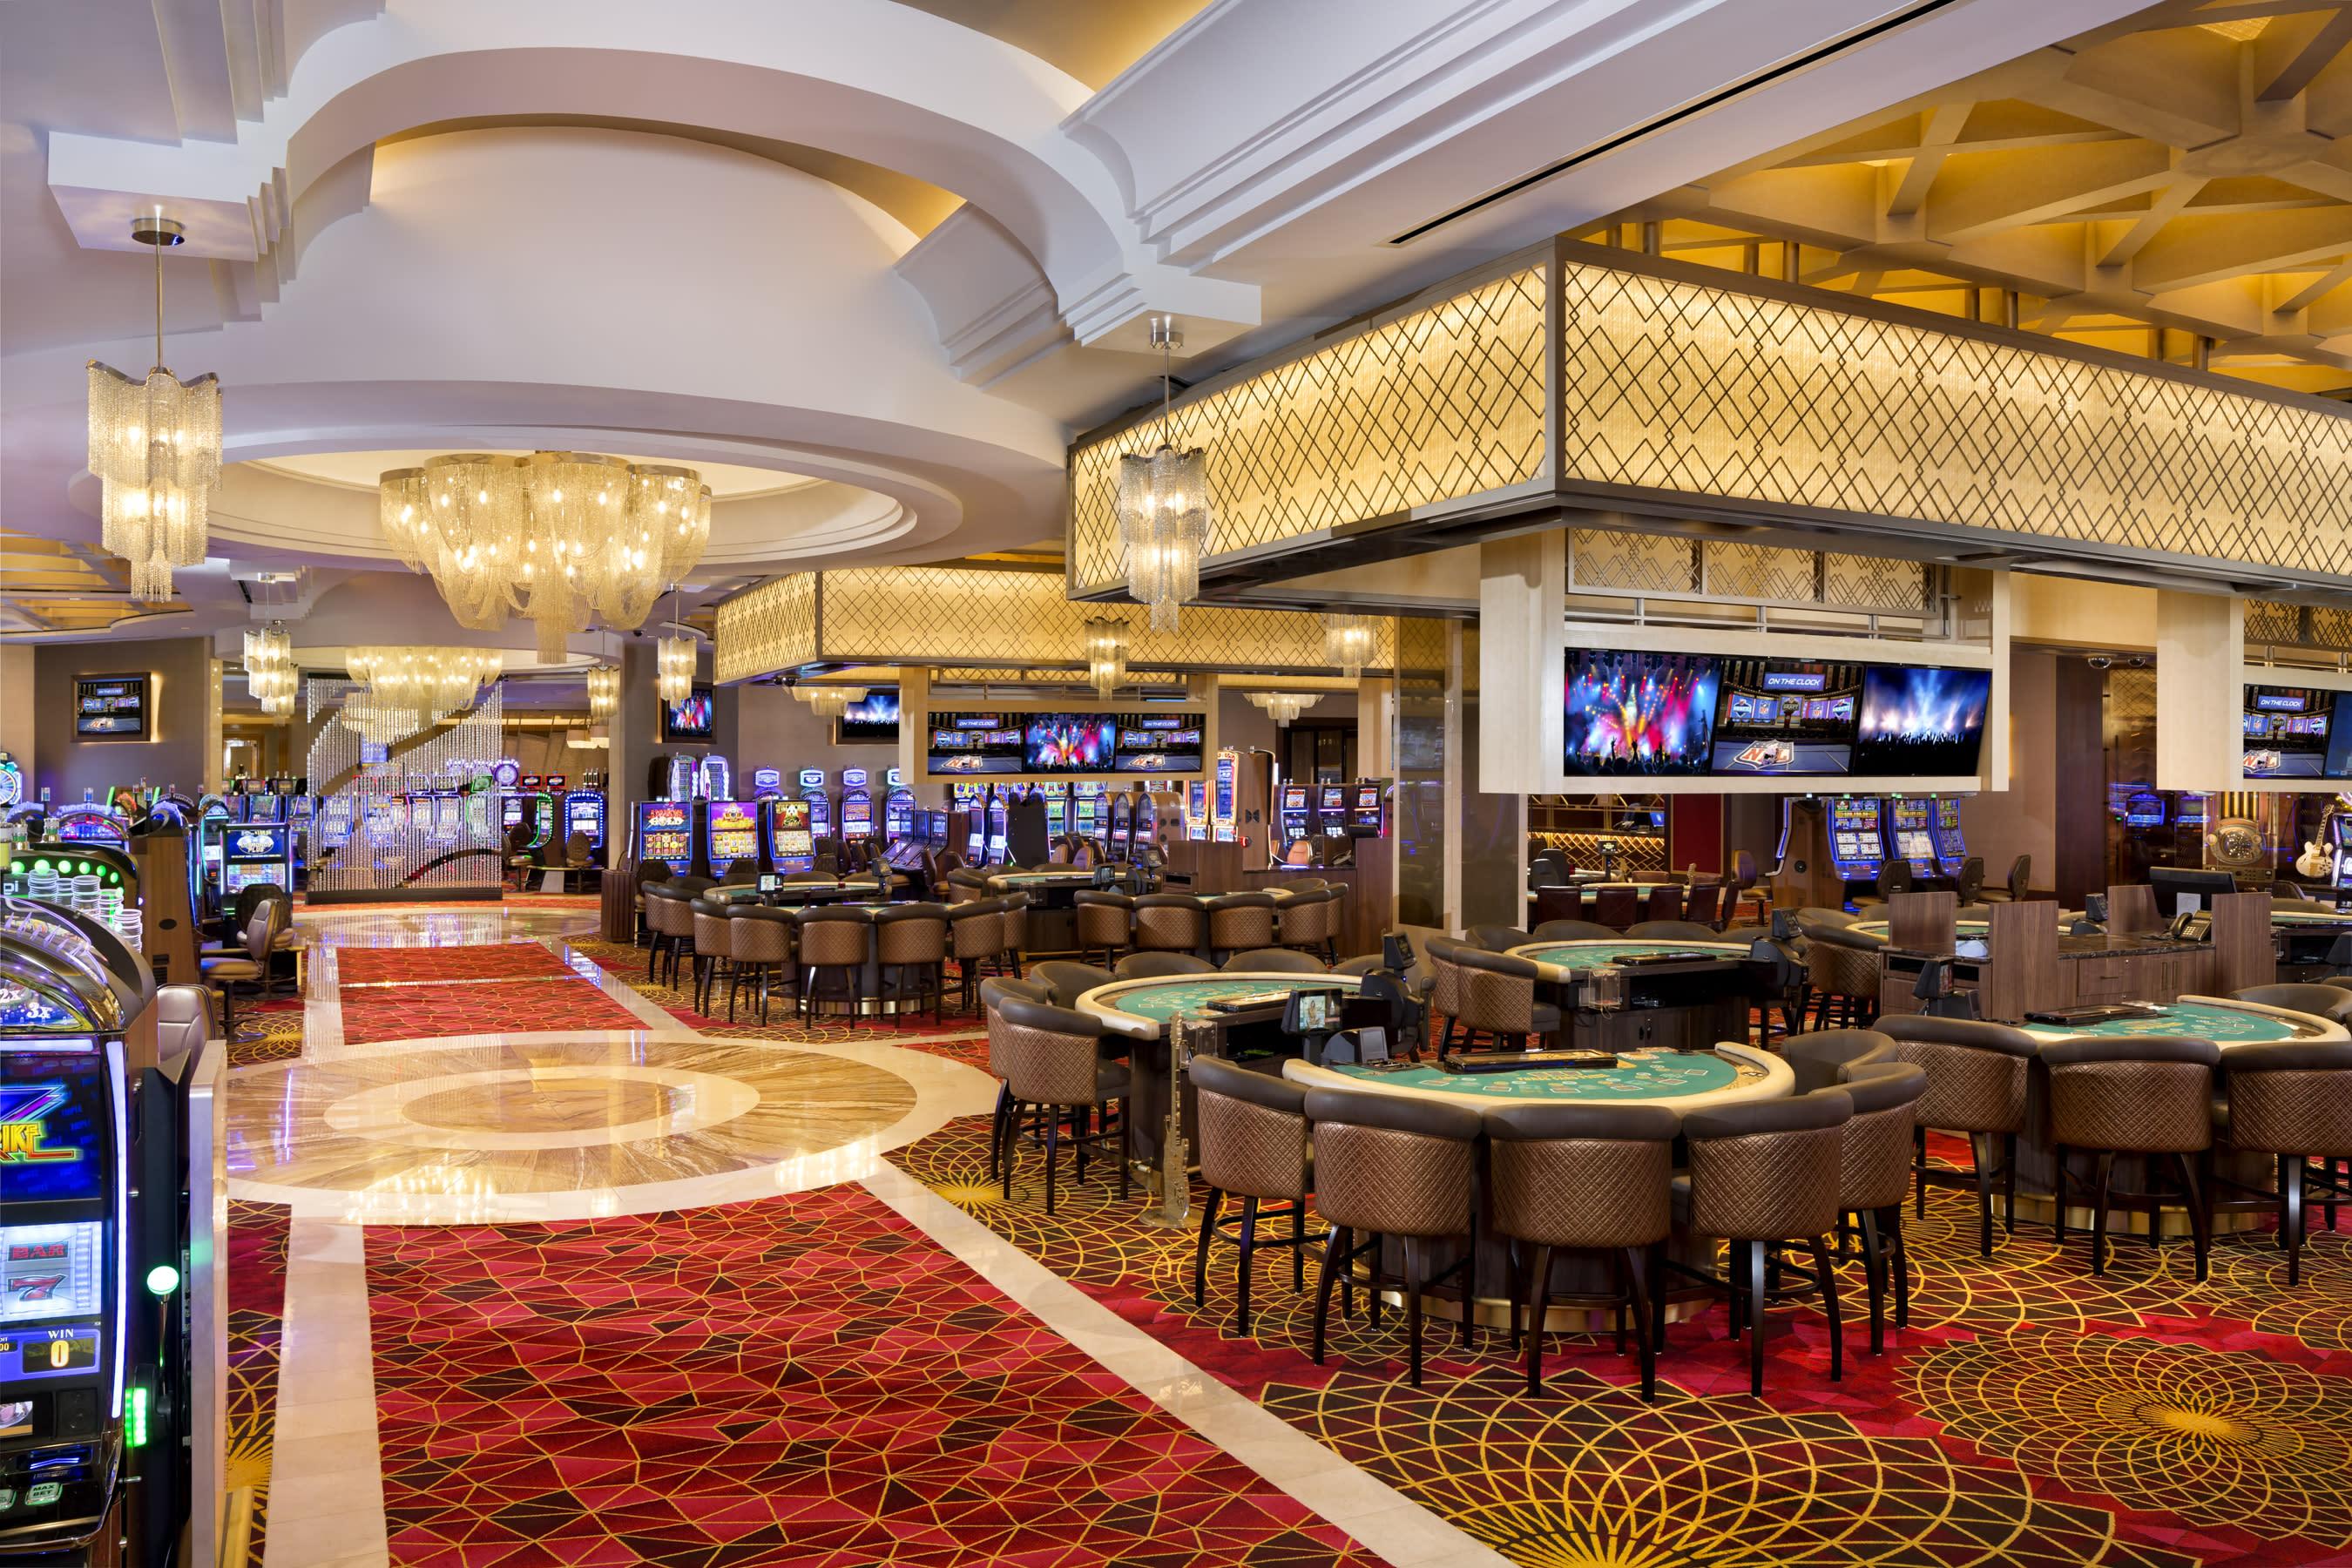 Hard rock casino tampa history showboat casino entertainment